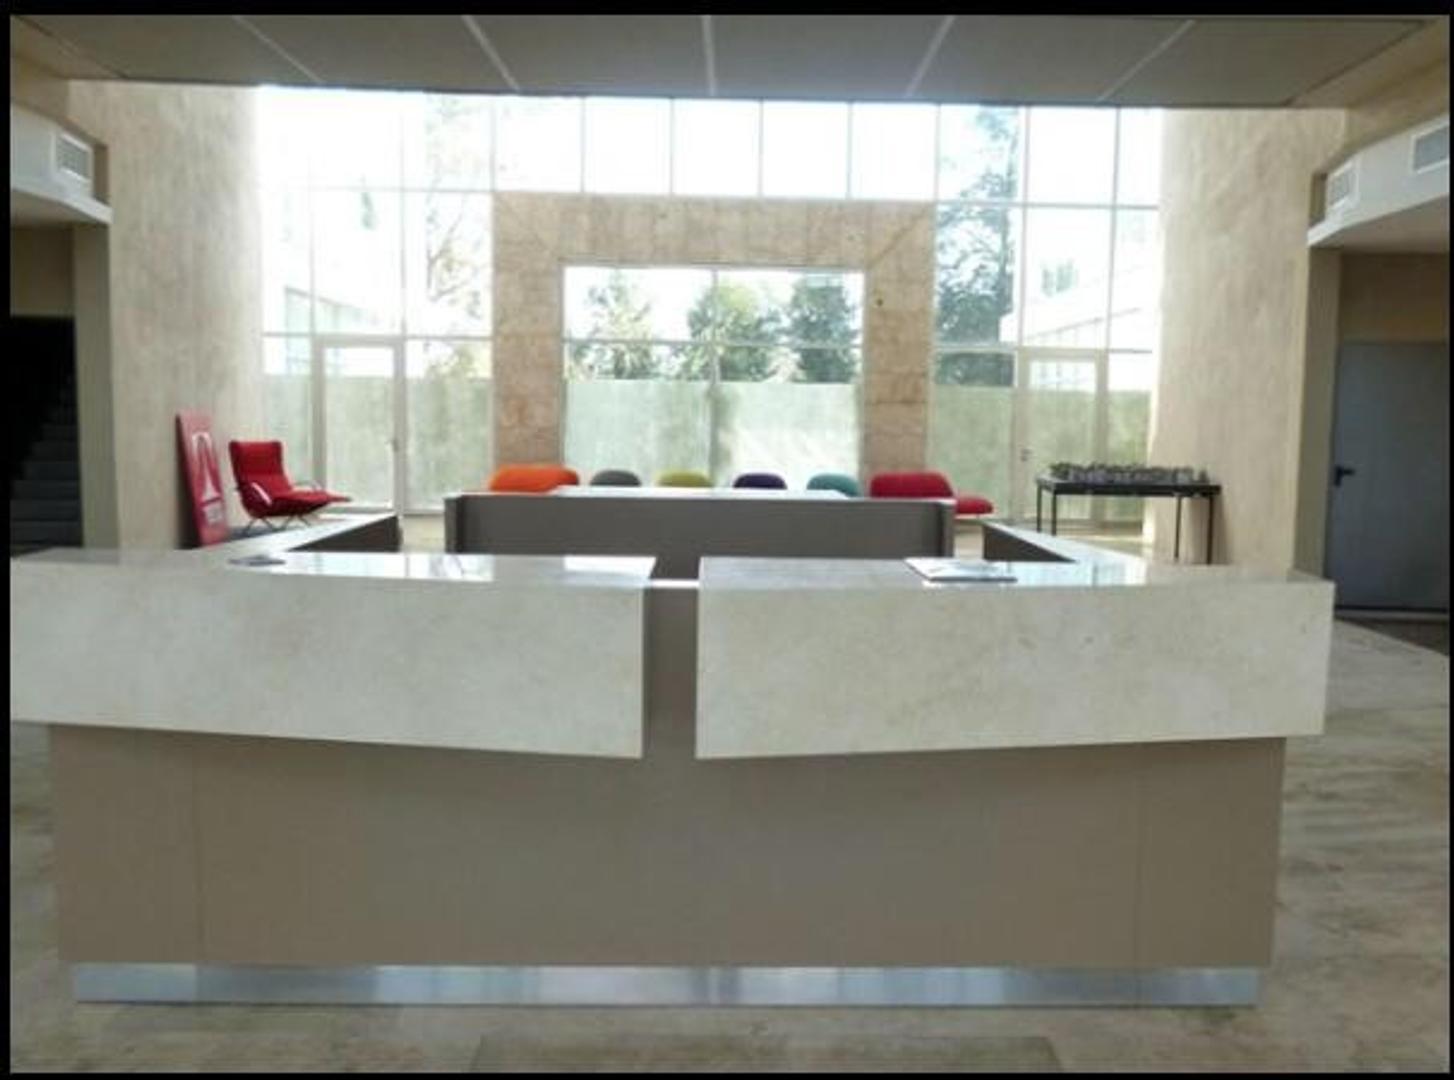 Oficina en Alquiler en Canning - 3 ambientes